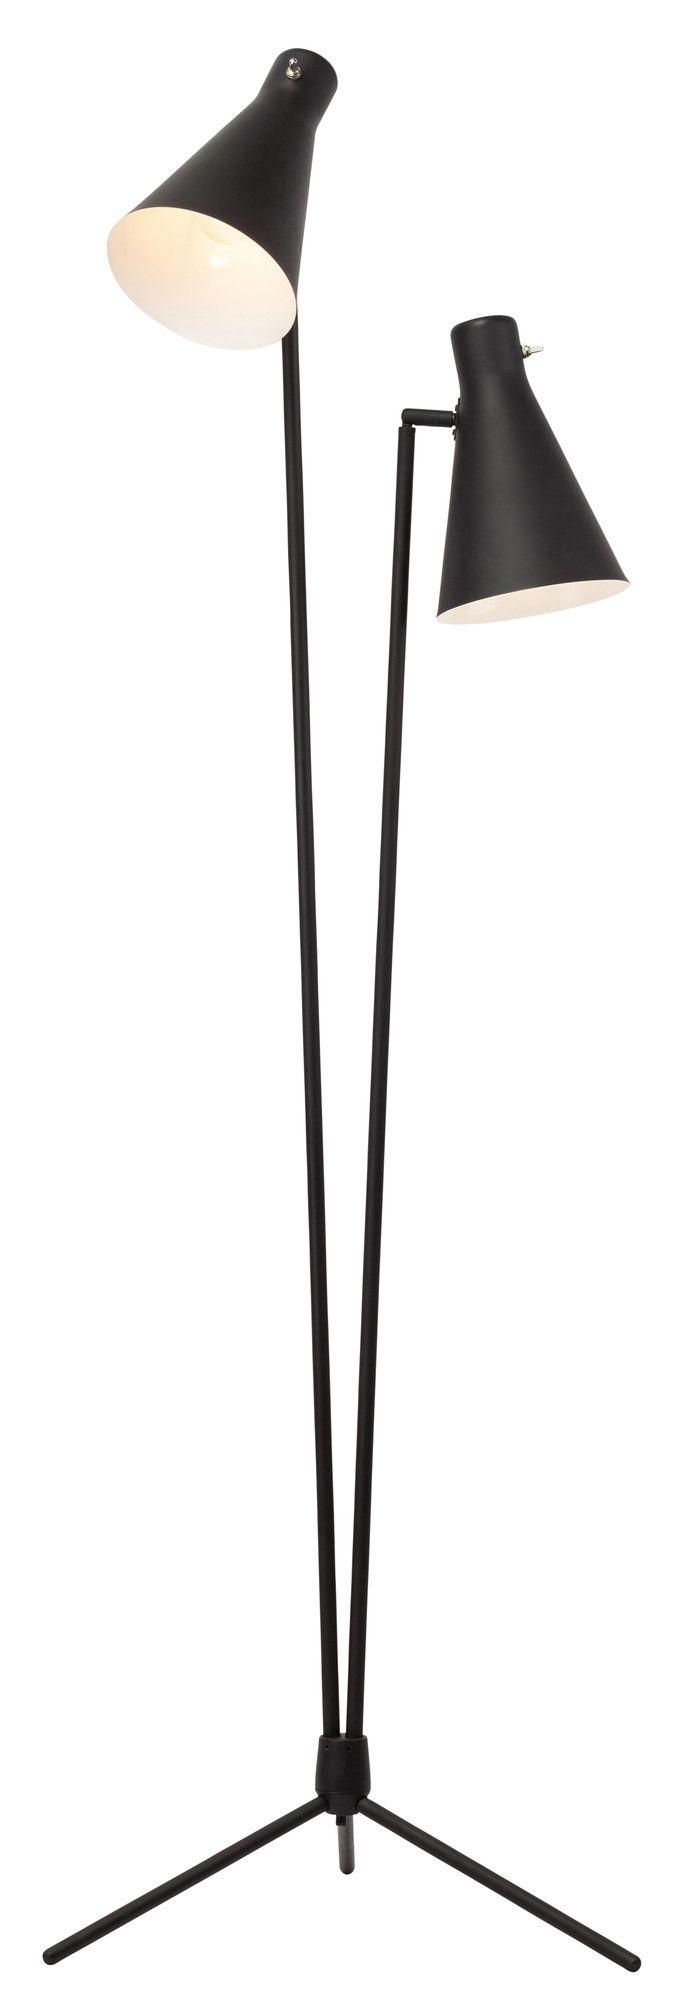 Threshold torchiere floor lamp textured bronze 65 - Adriana 64 25 Tree Floor Lamp